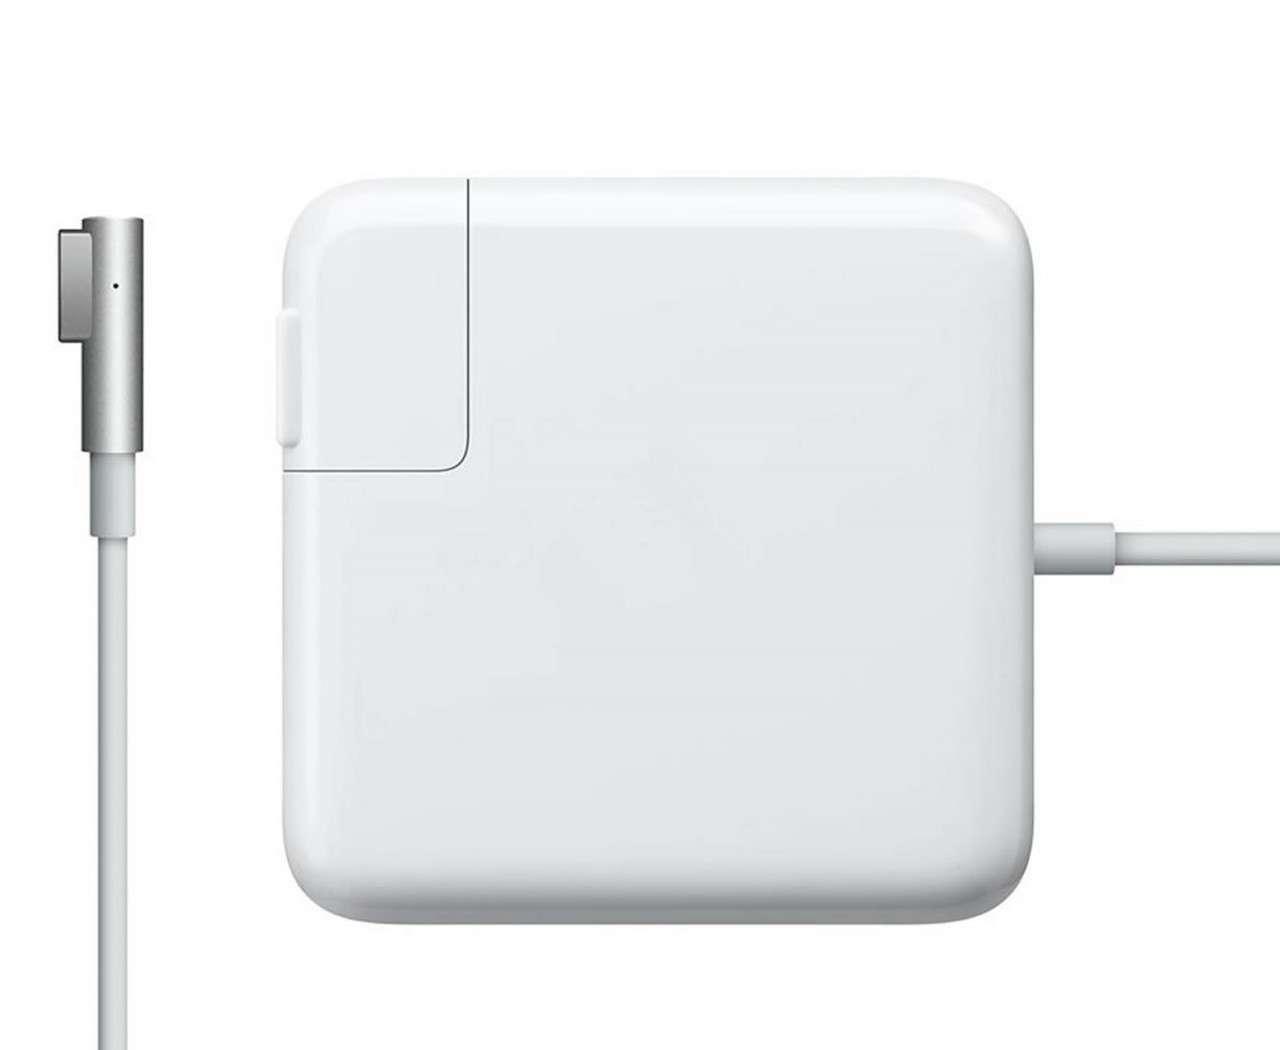 Incarcator Apple MacBook Pro 13 inch MagSafe 60w imagine